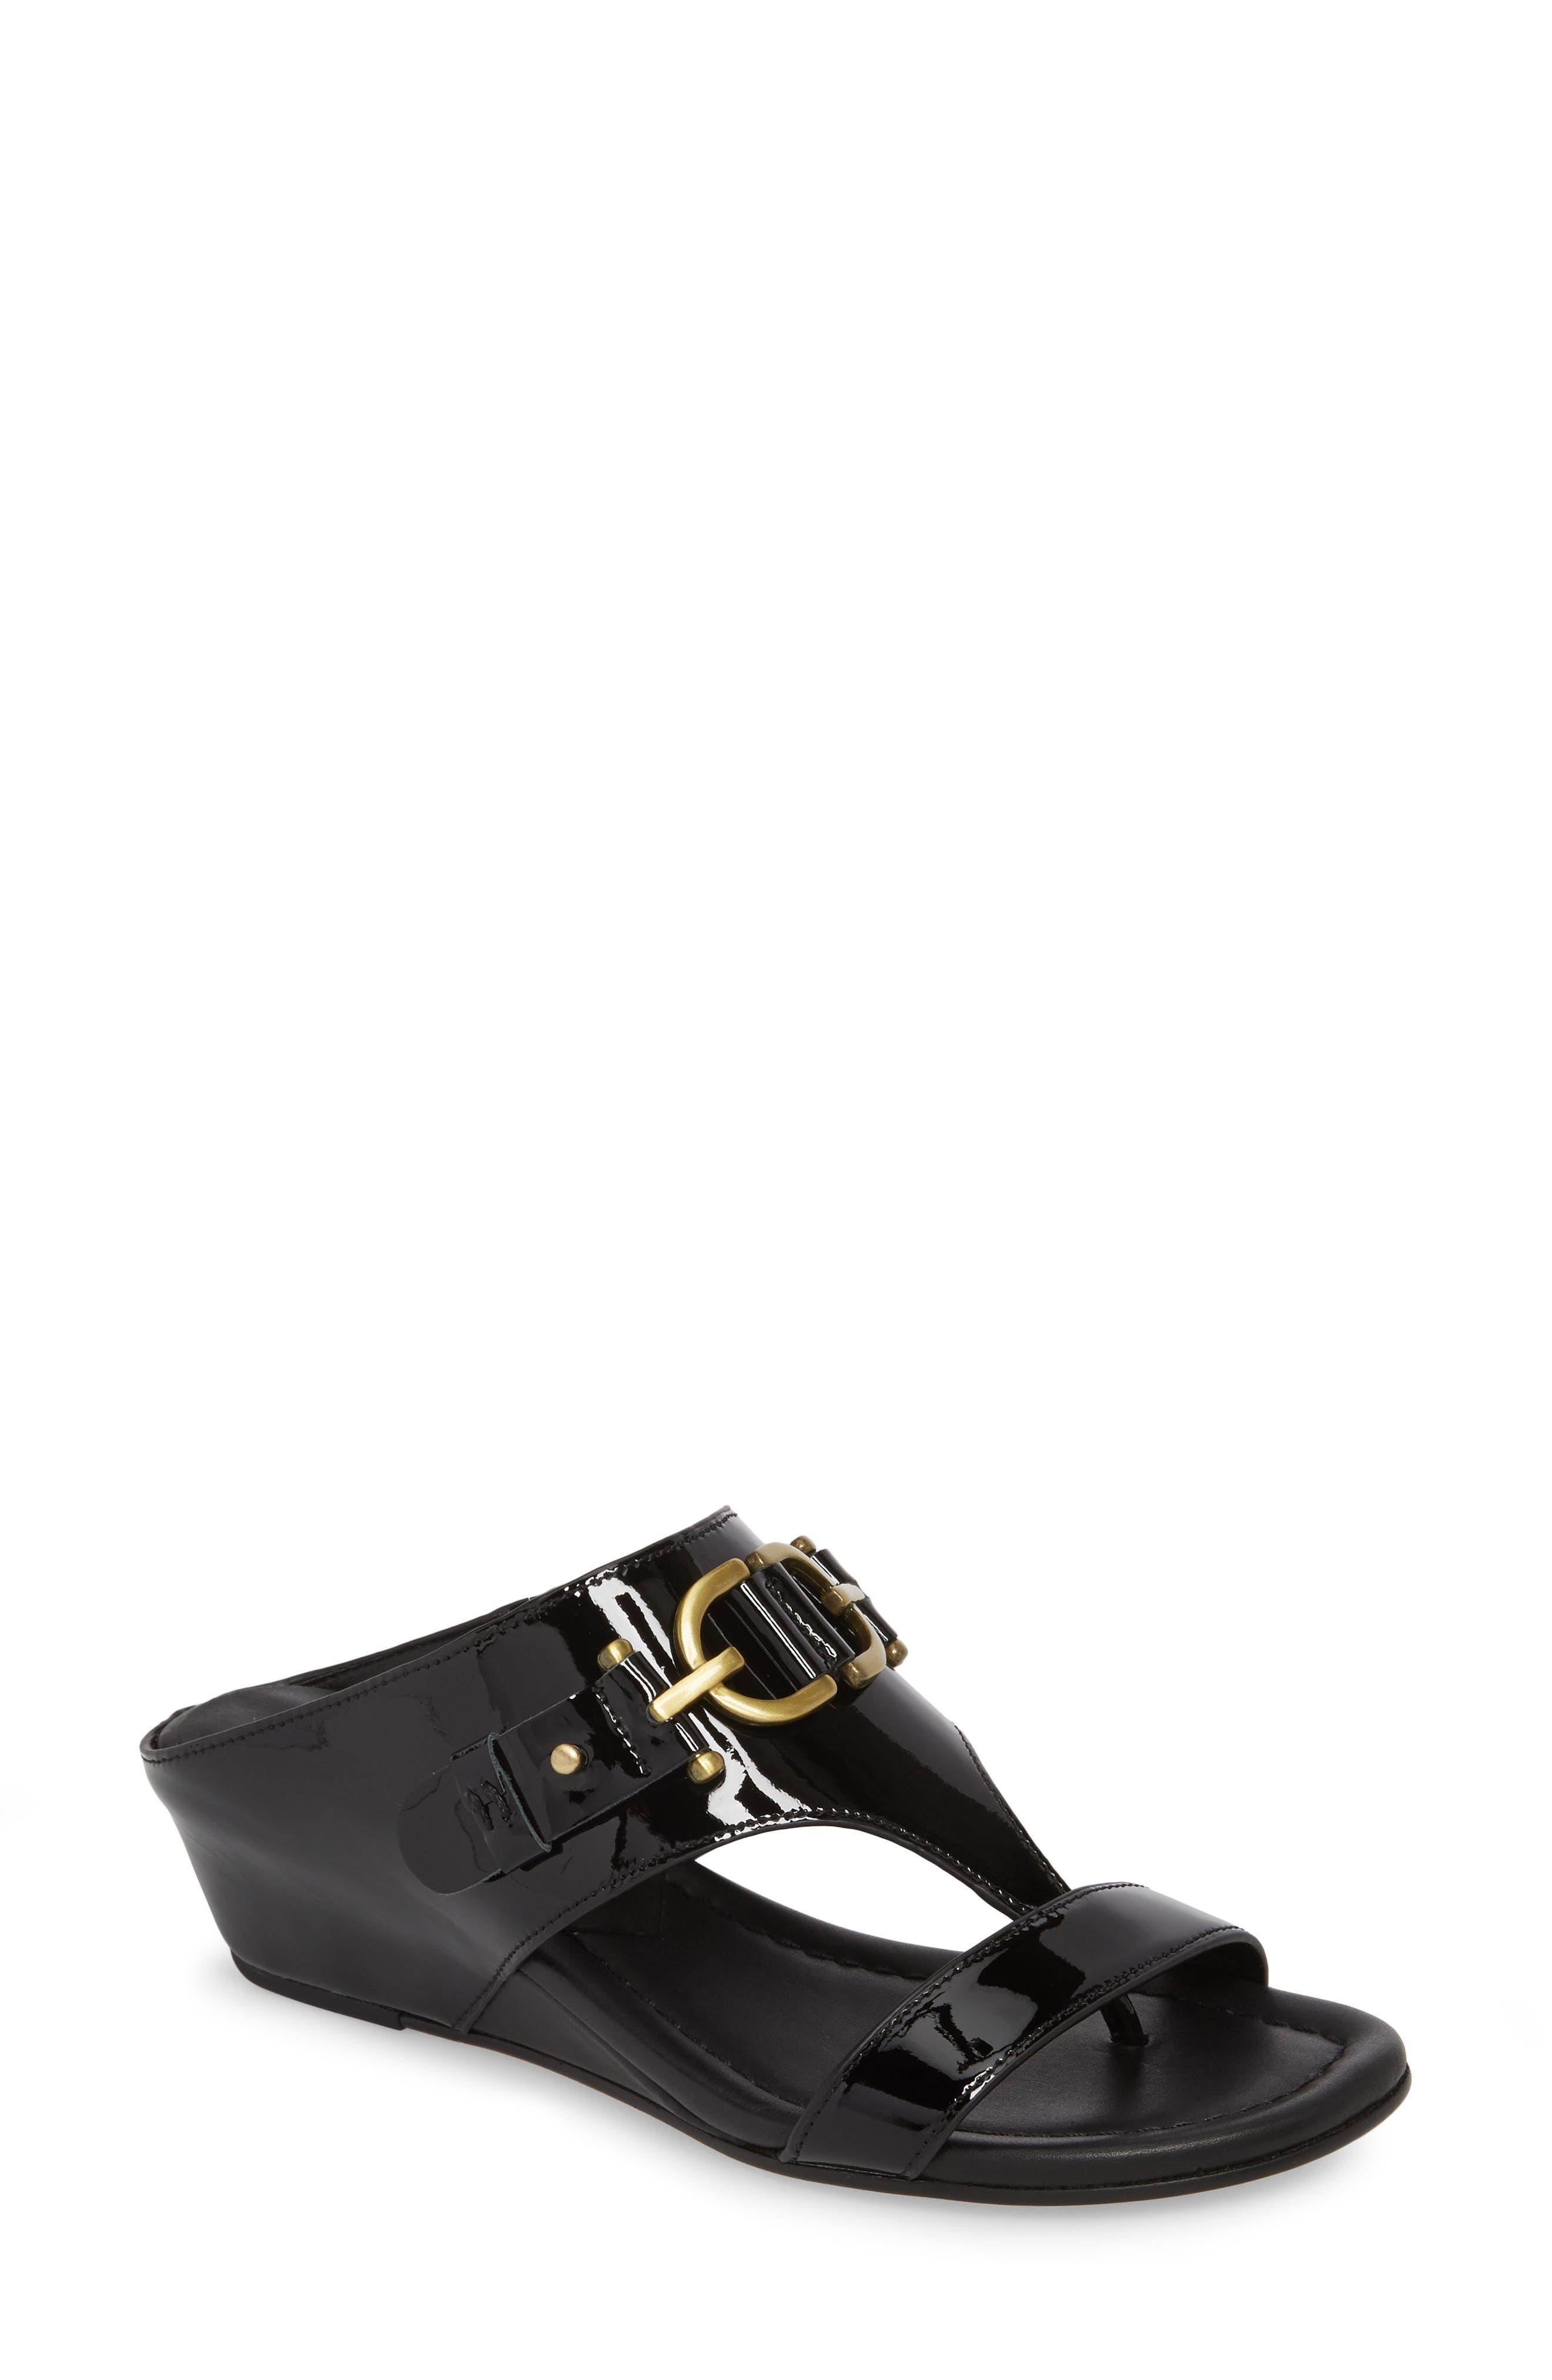 Dayna Wedge Sandal,                             Main thumbnail 1, color,                             Black Leather